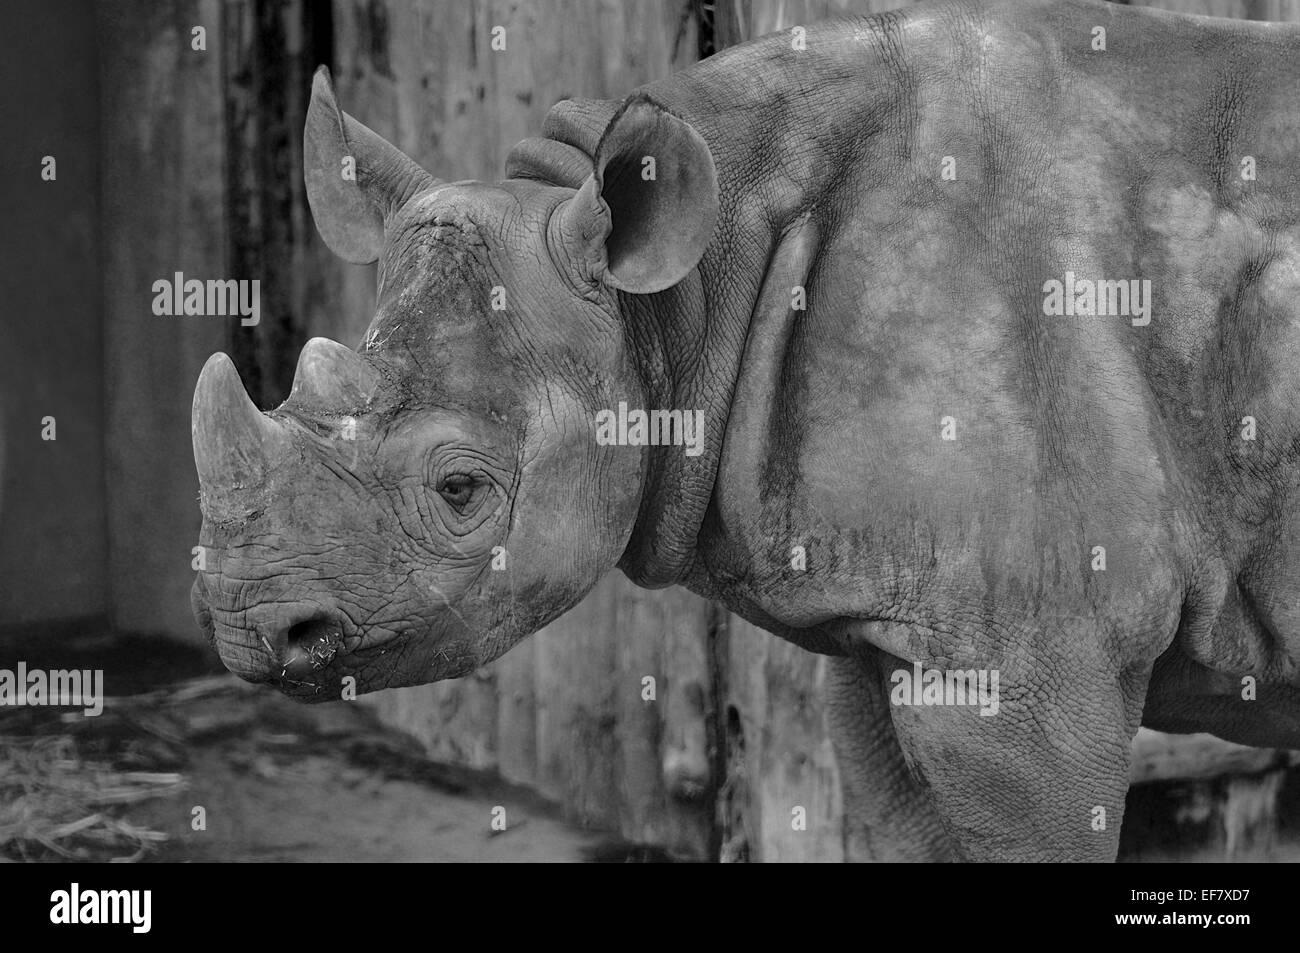 Rhinoceros Side View - Stock Image